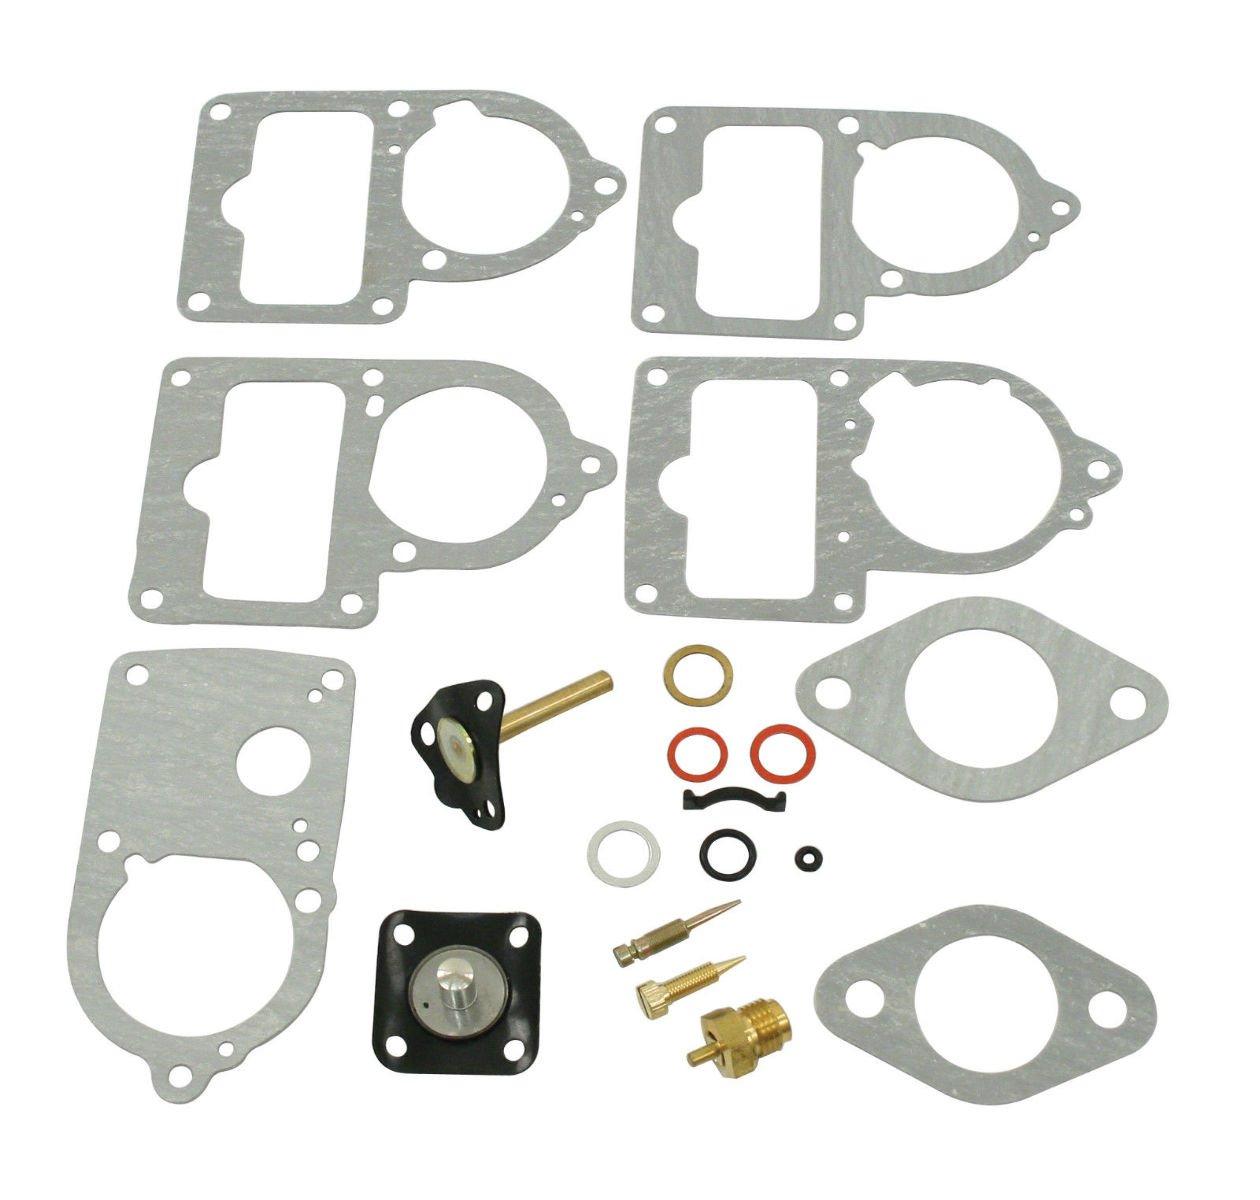 Durable Top Quality KIPA Carburetor Rebuild kit For VW SOLEX Brosol Bocar EMPI 28 30 34 PICT-3 Stock Carburetor Repair With Float /& 12V Cut off Valve Solenoid